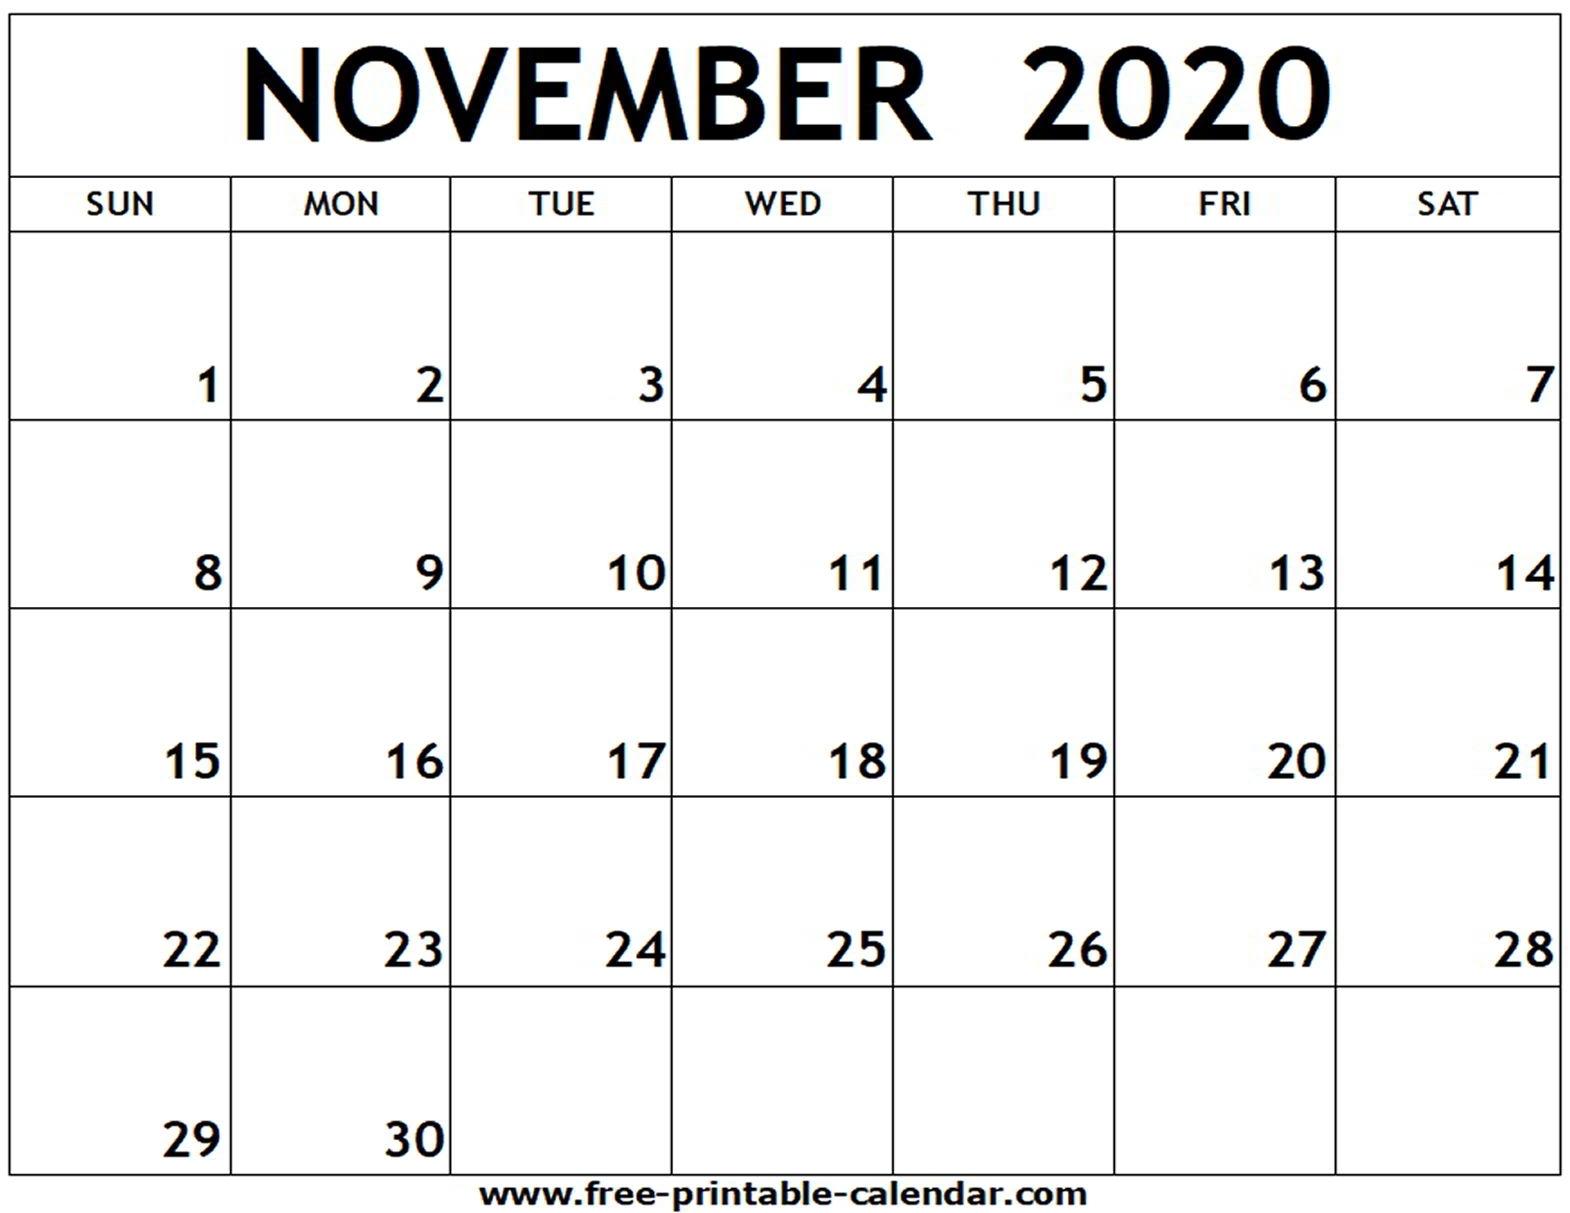 November 2020 Printable Calendar - Free-Printable-Calendar